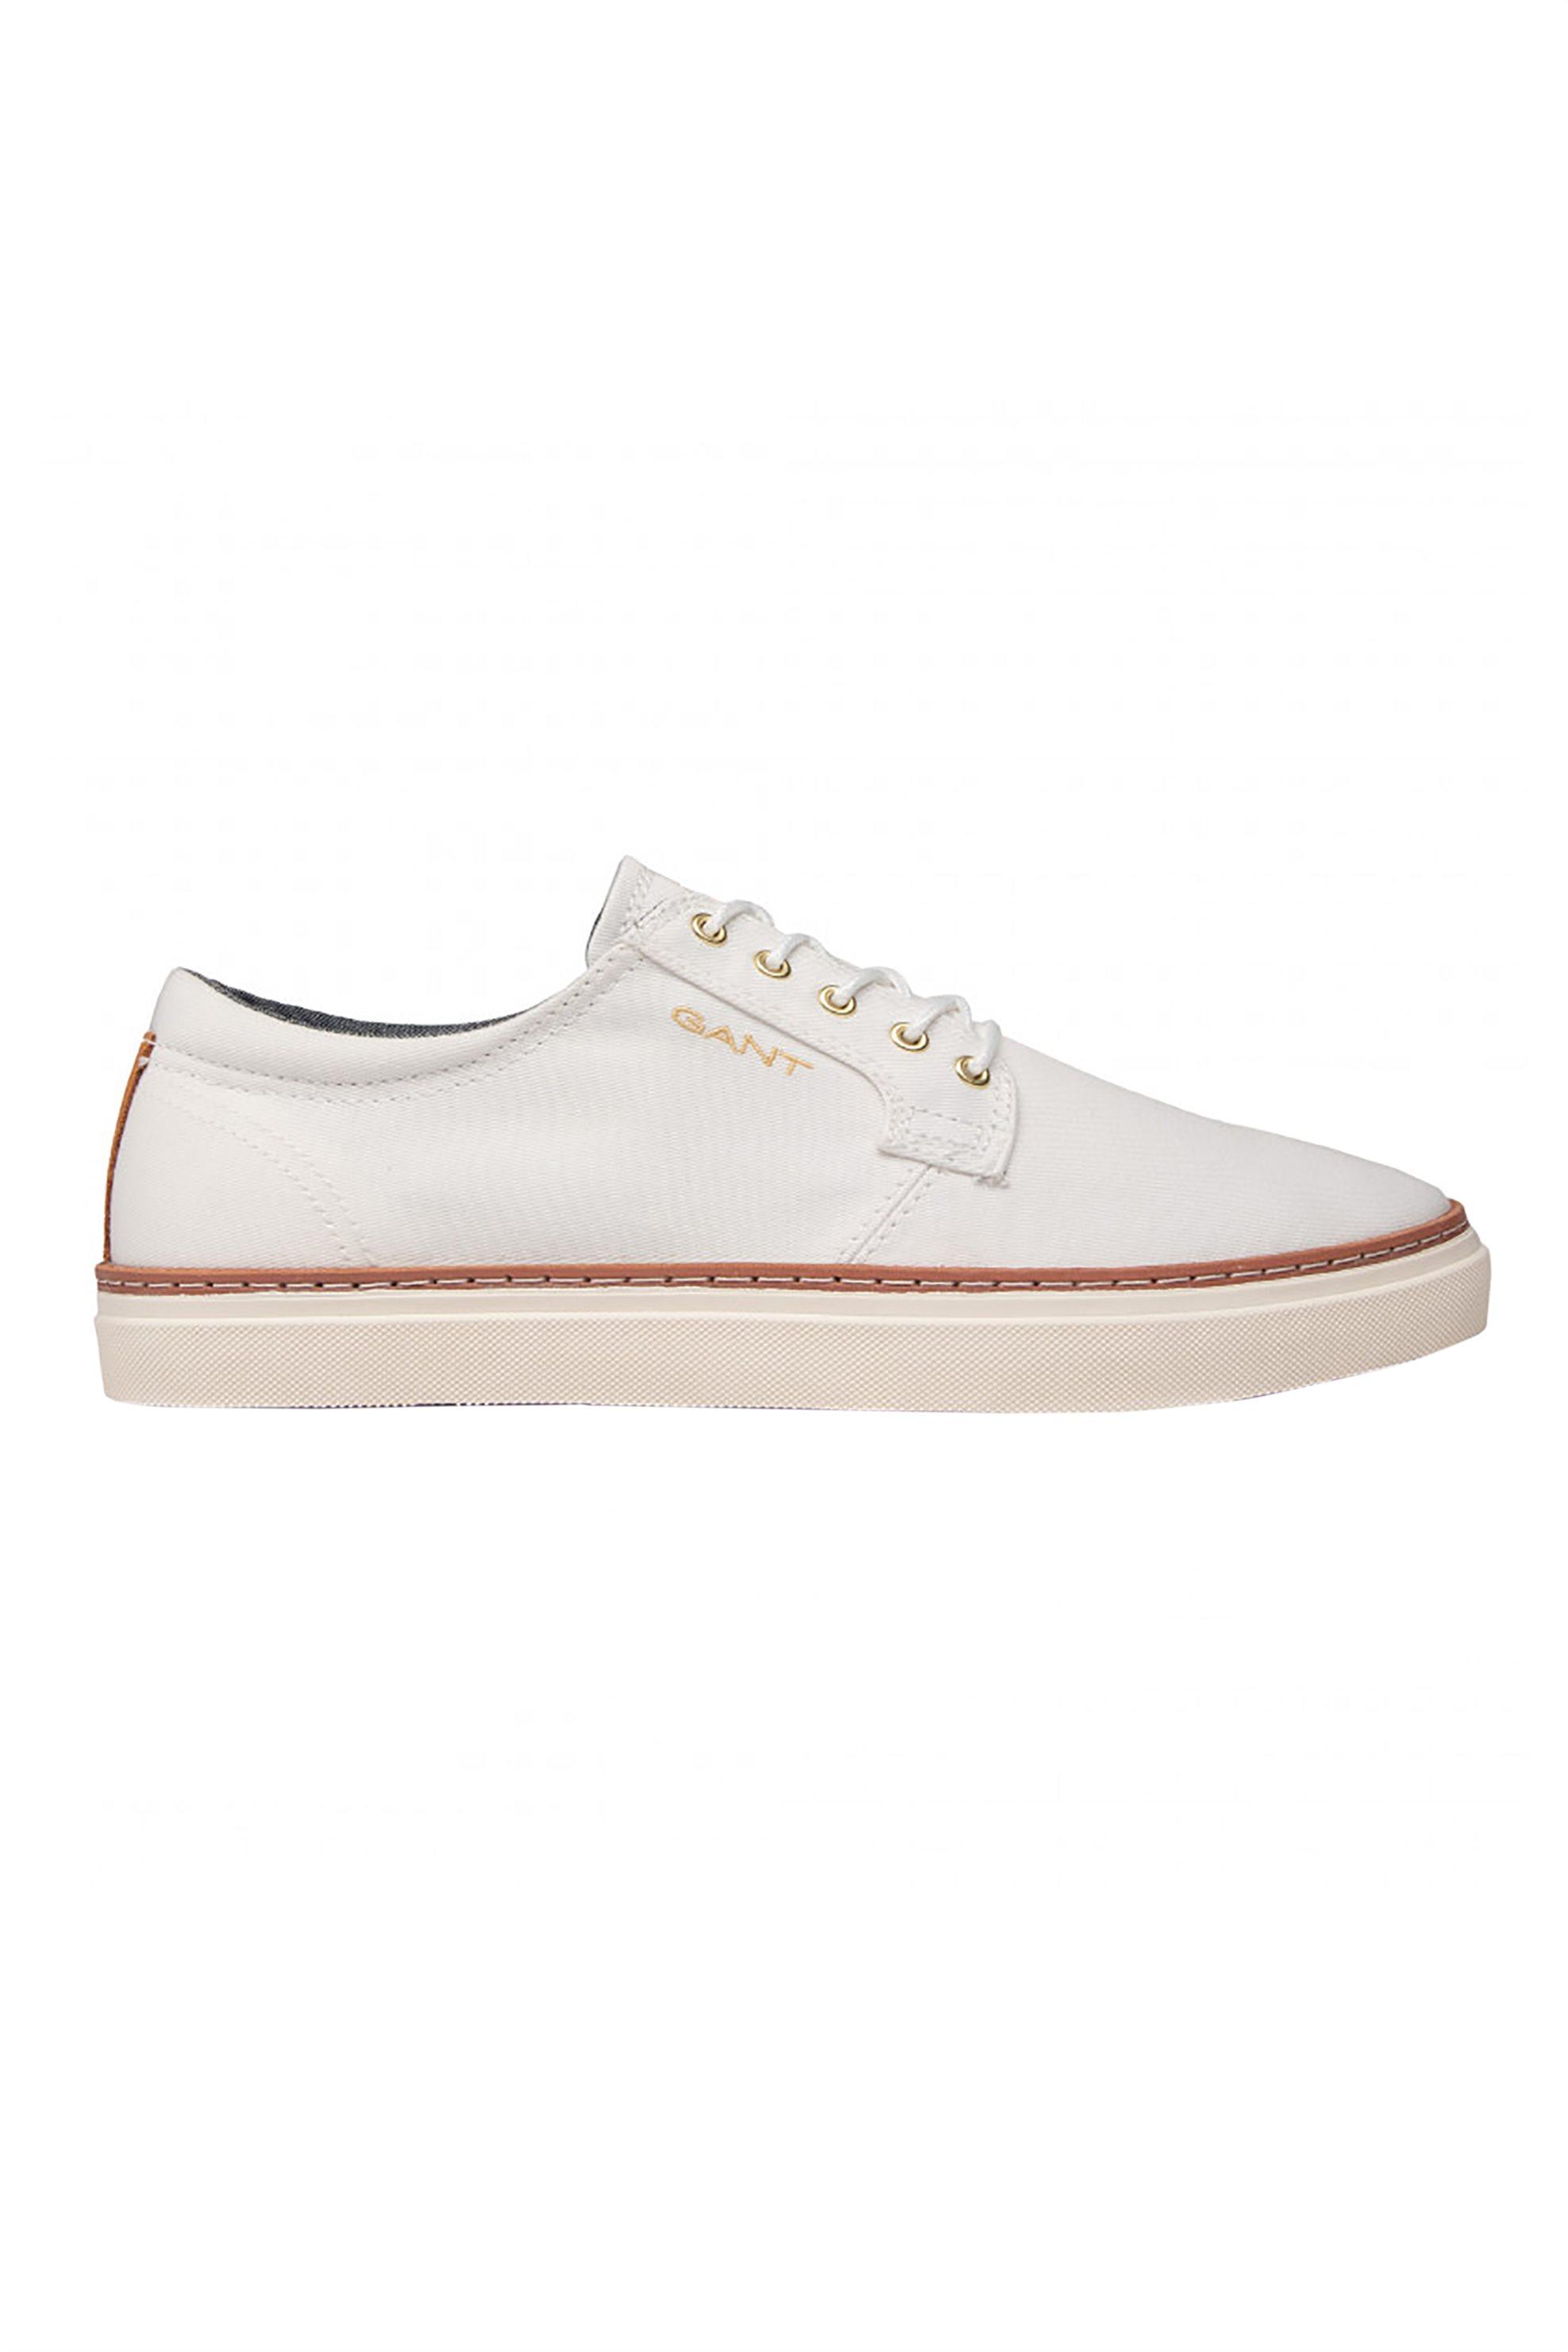 "Gant ανδρικά sneakers με logo print στο πλάι και δερμάτινες λεπτομέρειες ""Prepville"" – 22638666 – Καφέ"